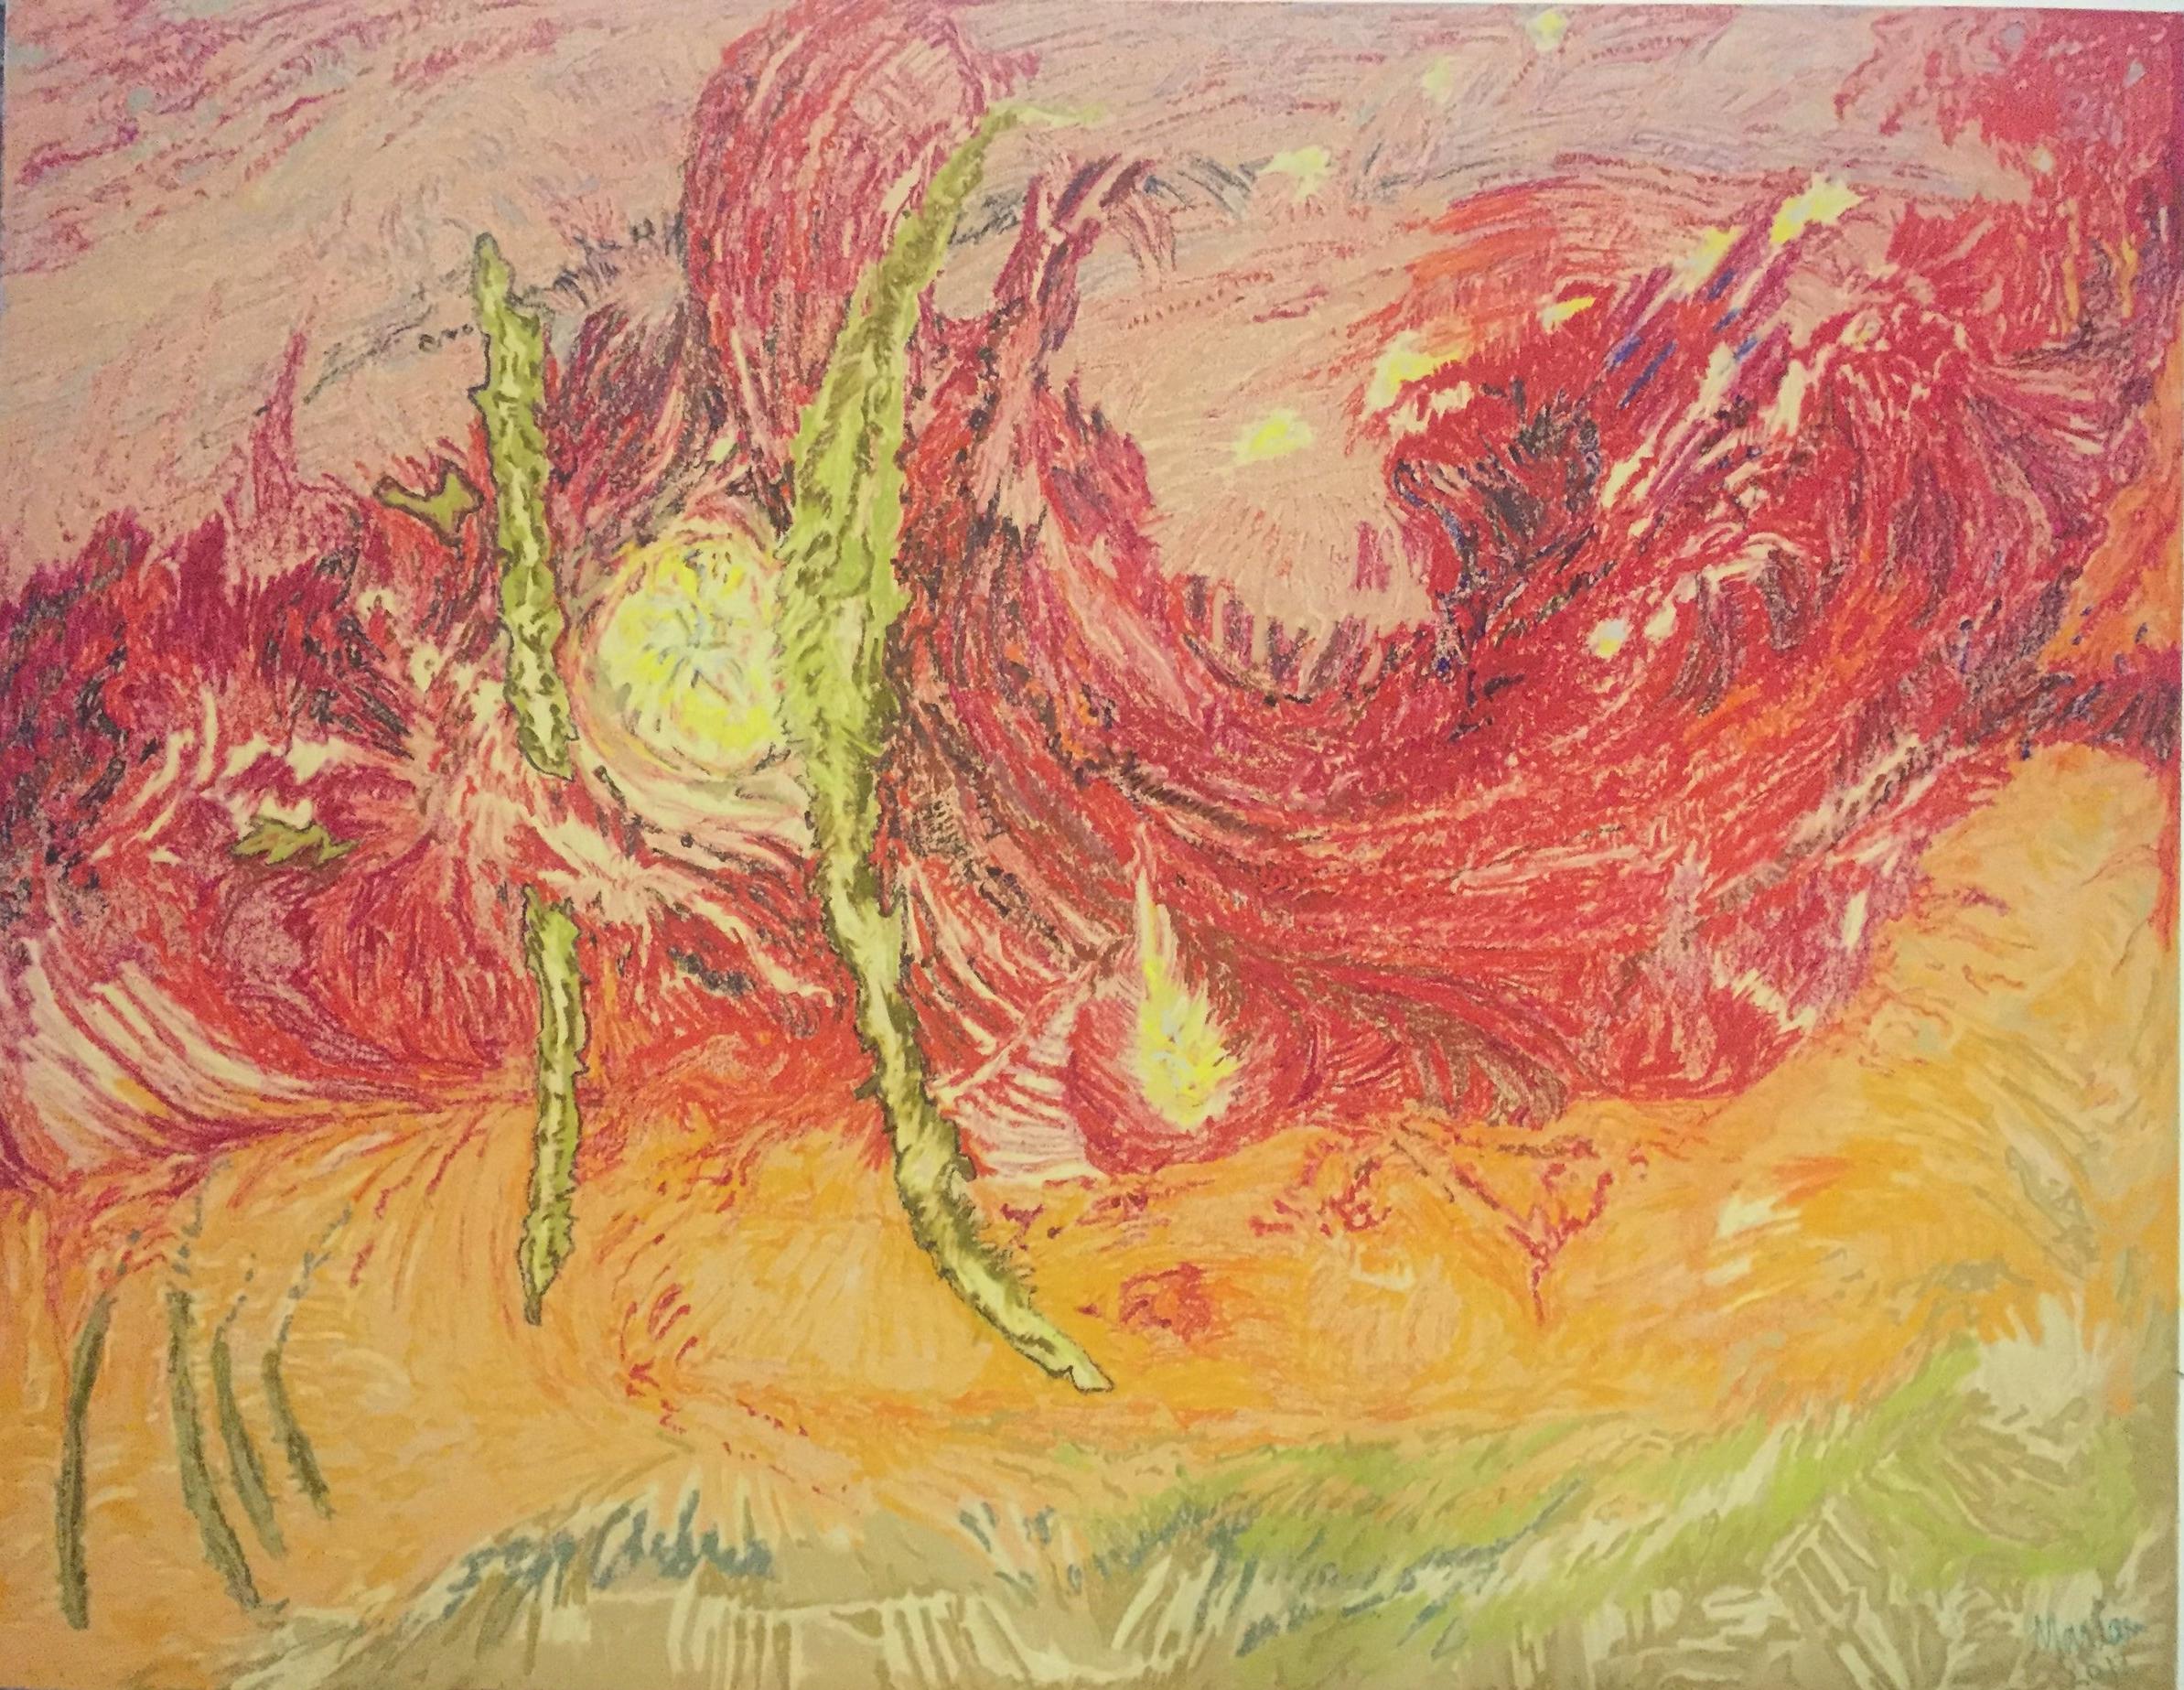 """Merede"" (2017). Oil pastel on card. 80 x 65cm."